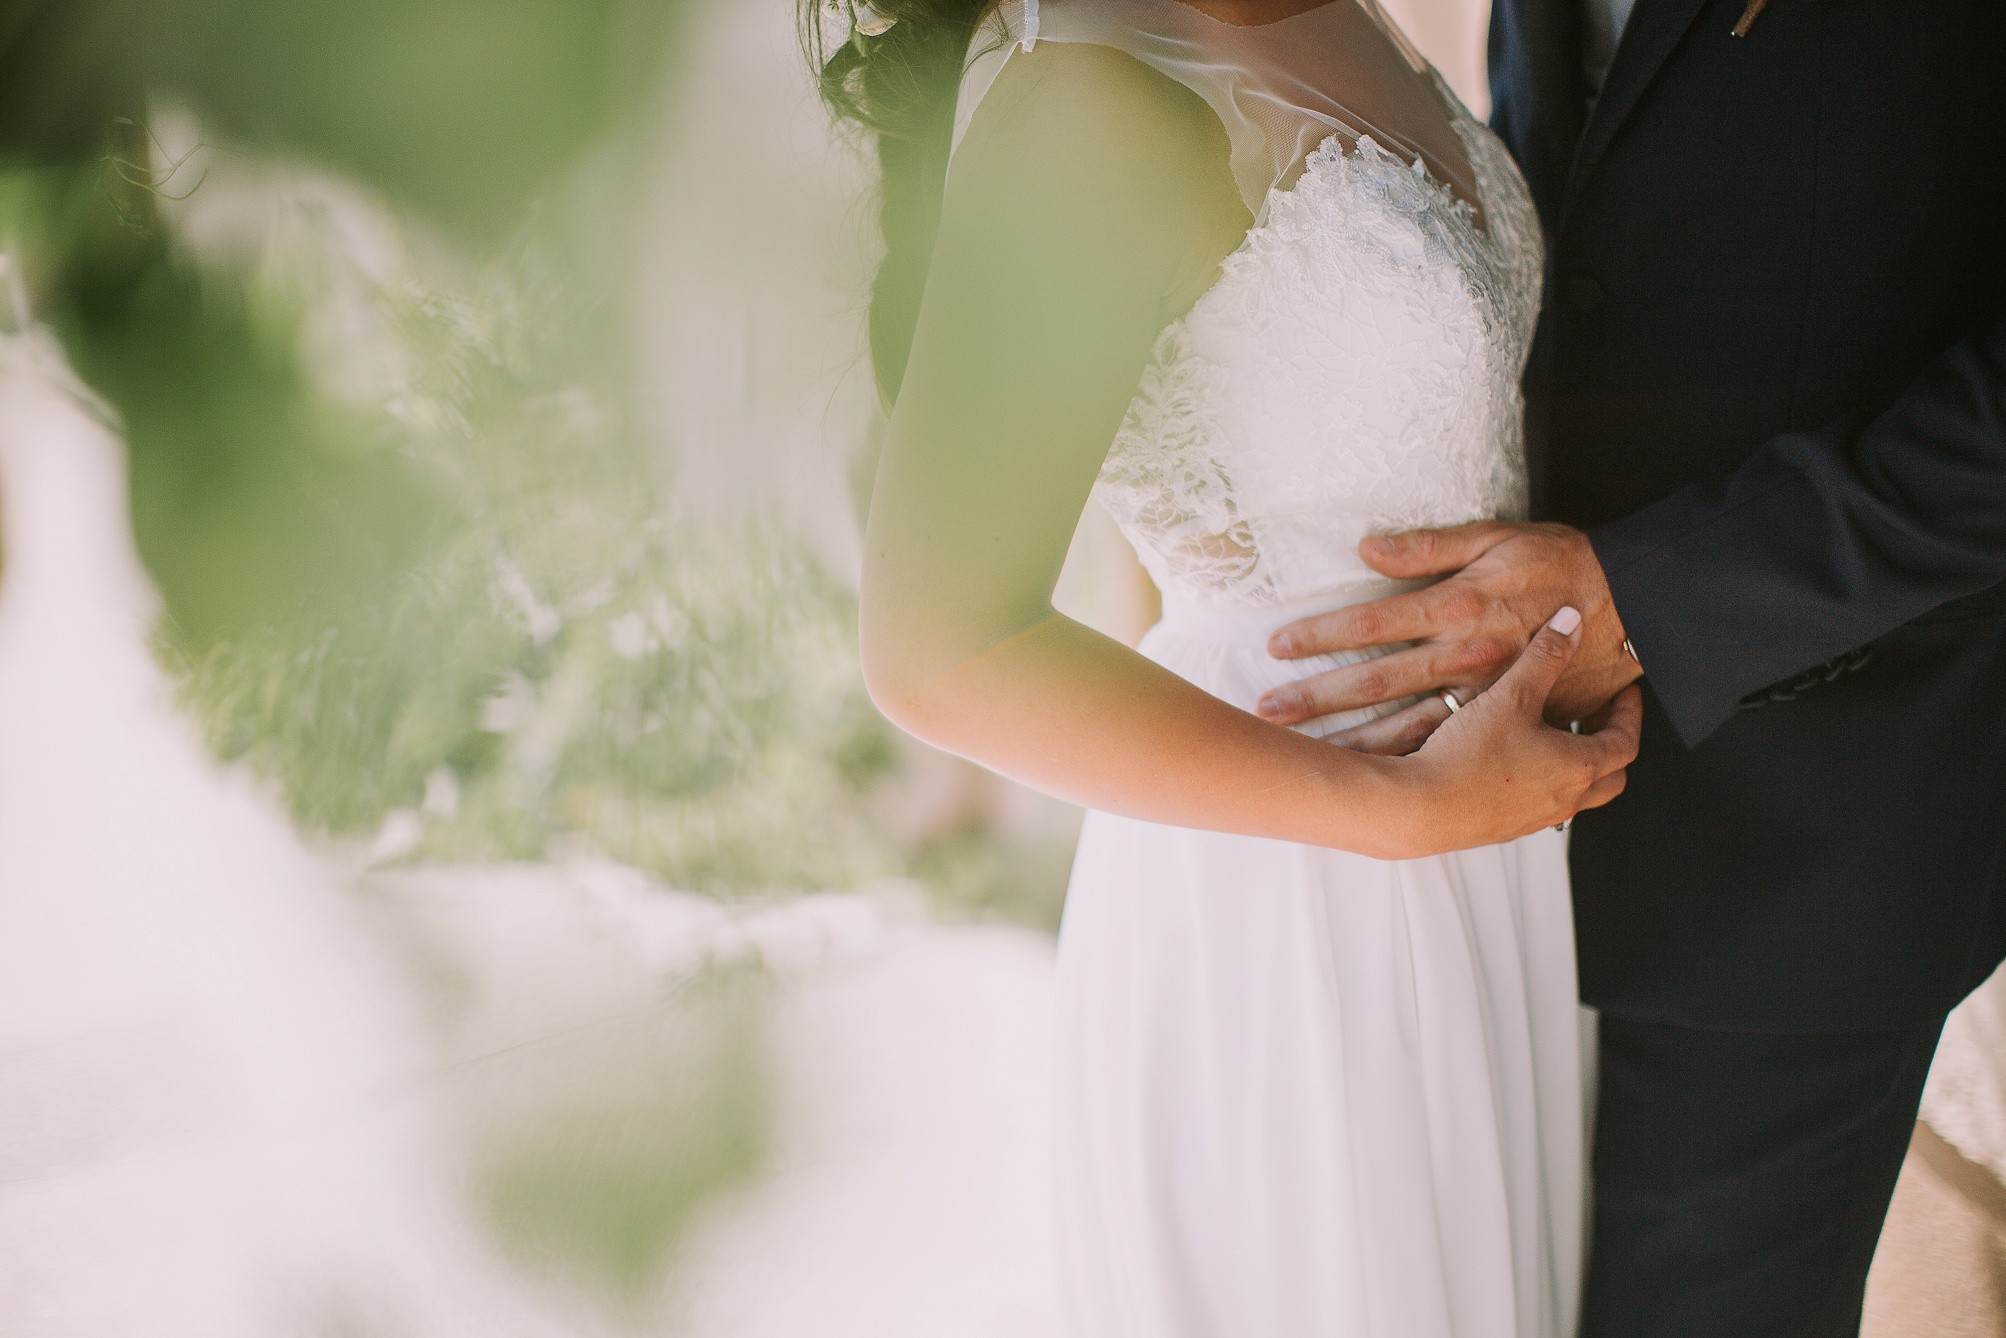 katerynaphotos-mariage-photographe-puyloubier-provence-aix-en-provence-sud-de-la-france_0374.jpg